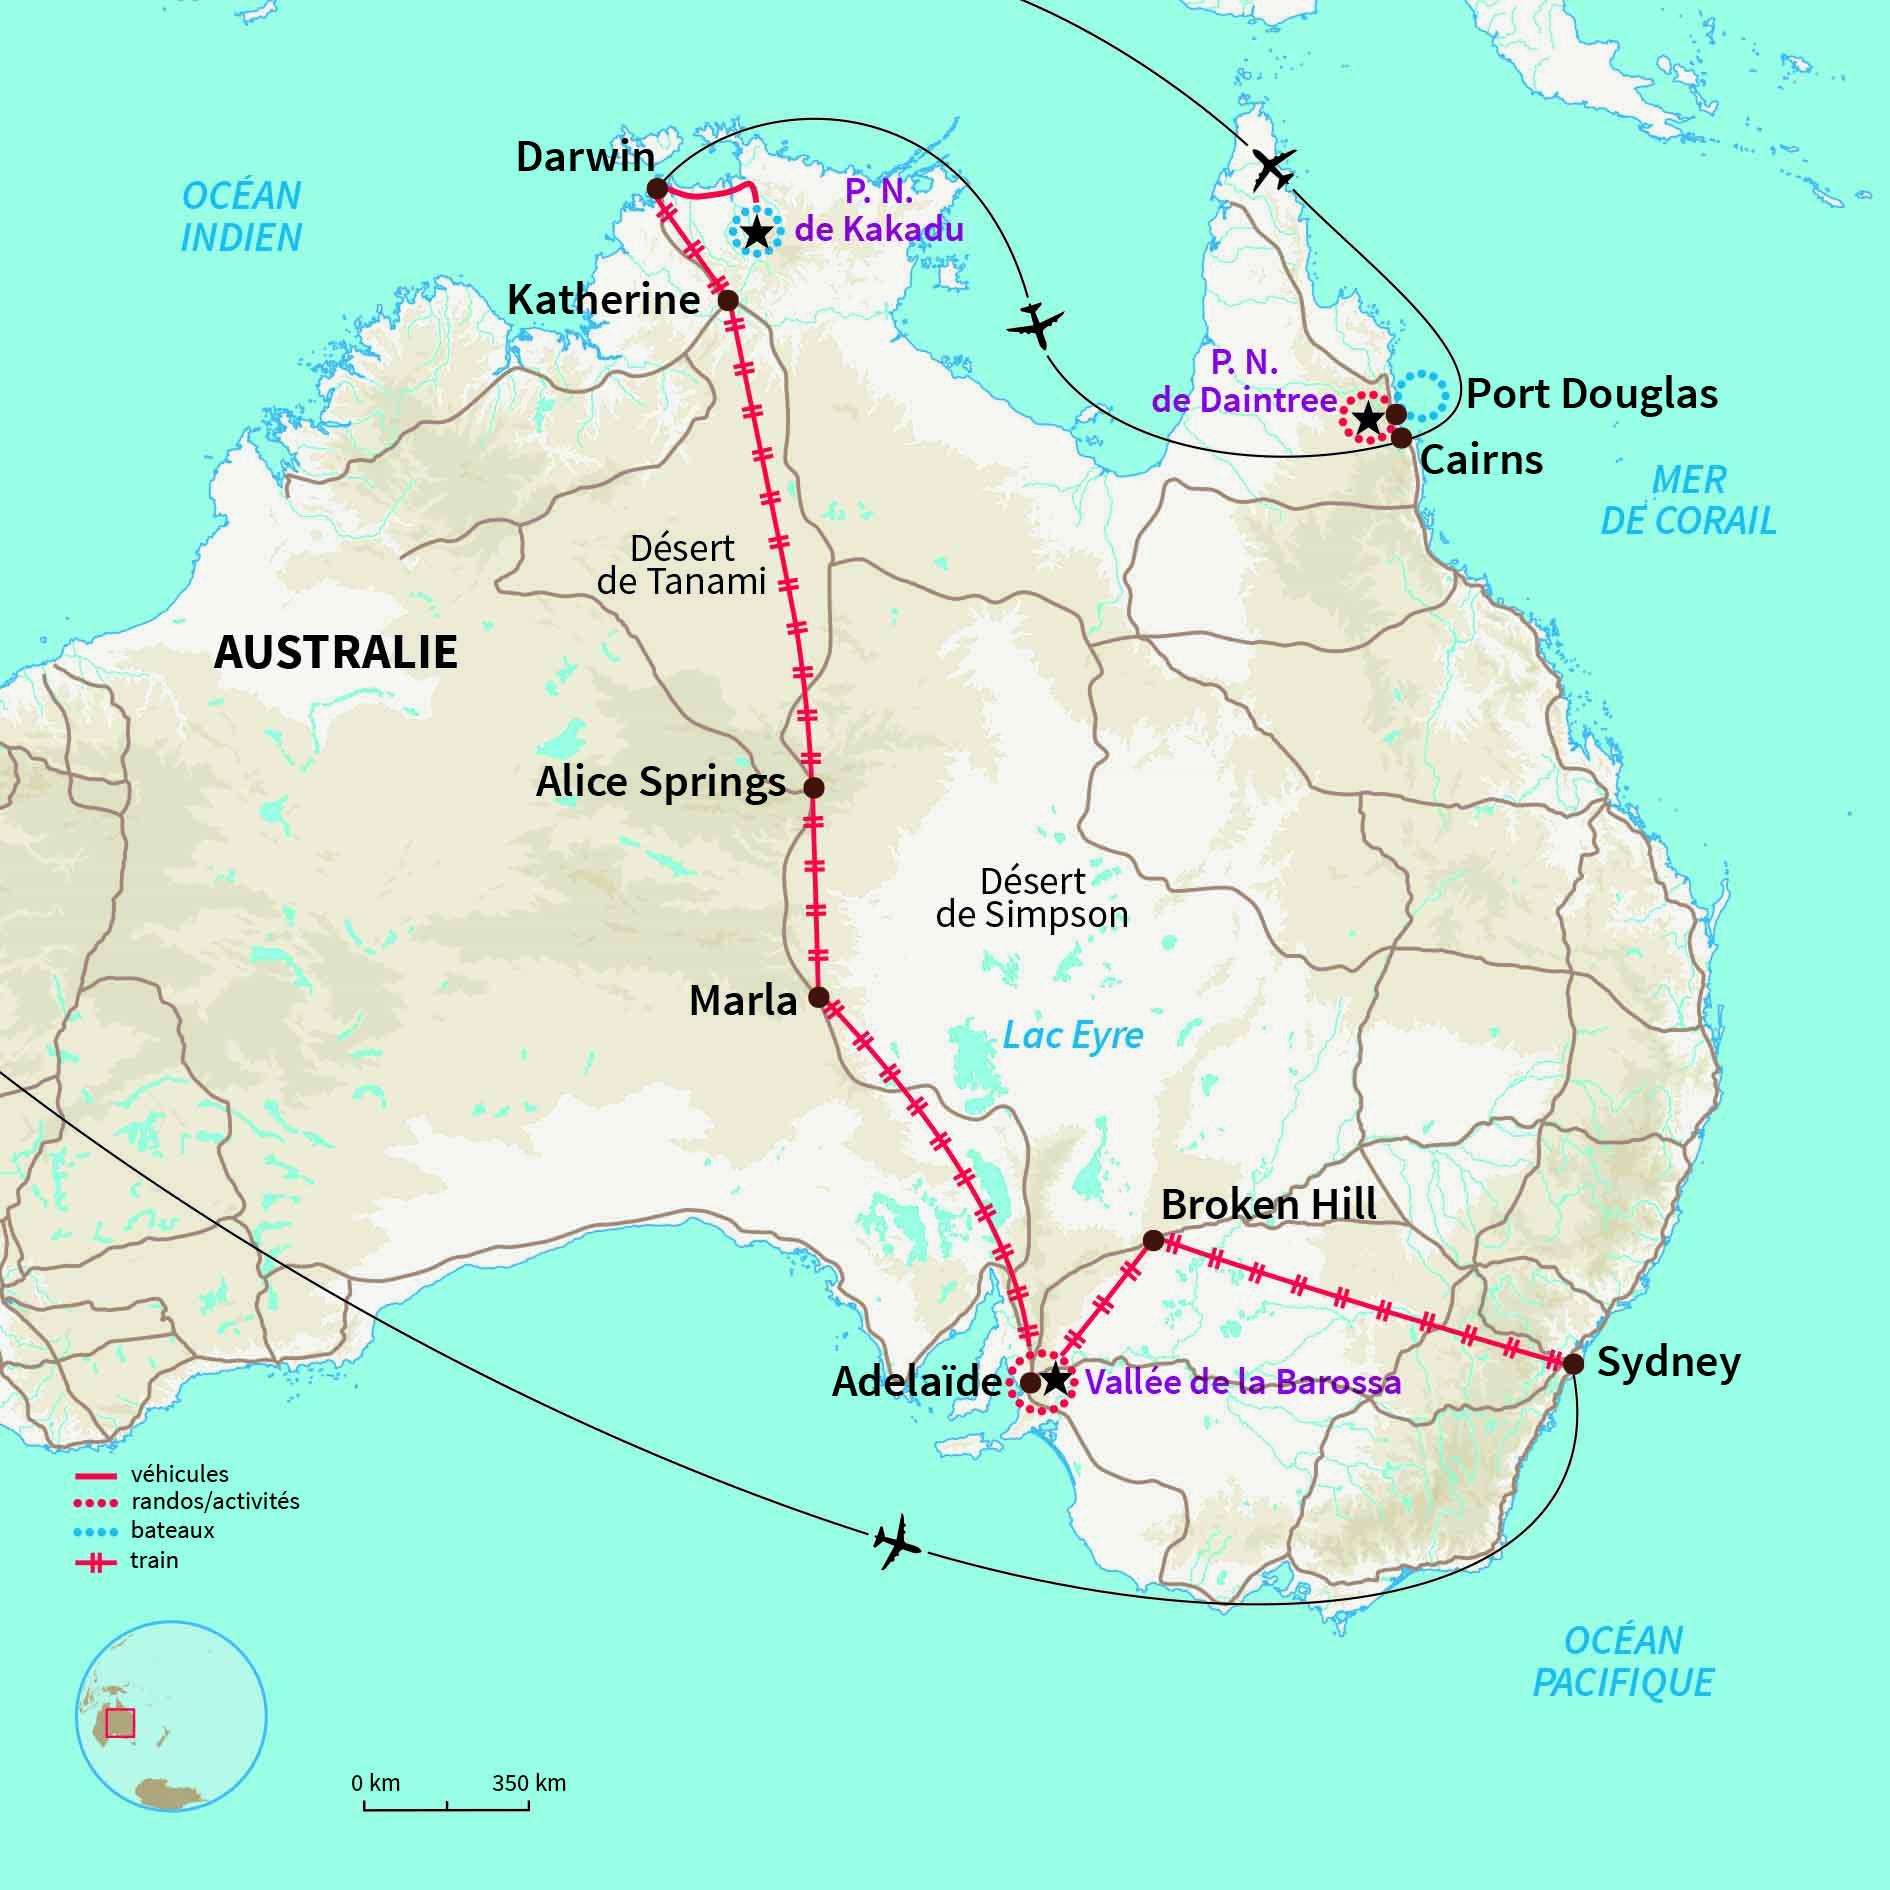 en ligne indien datant Australie